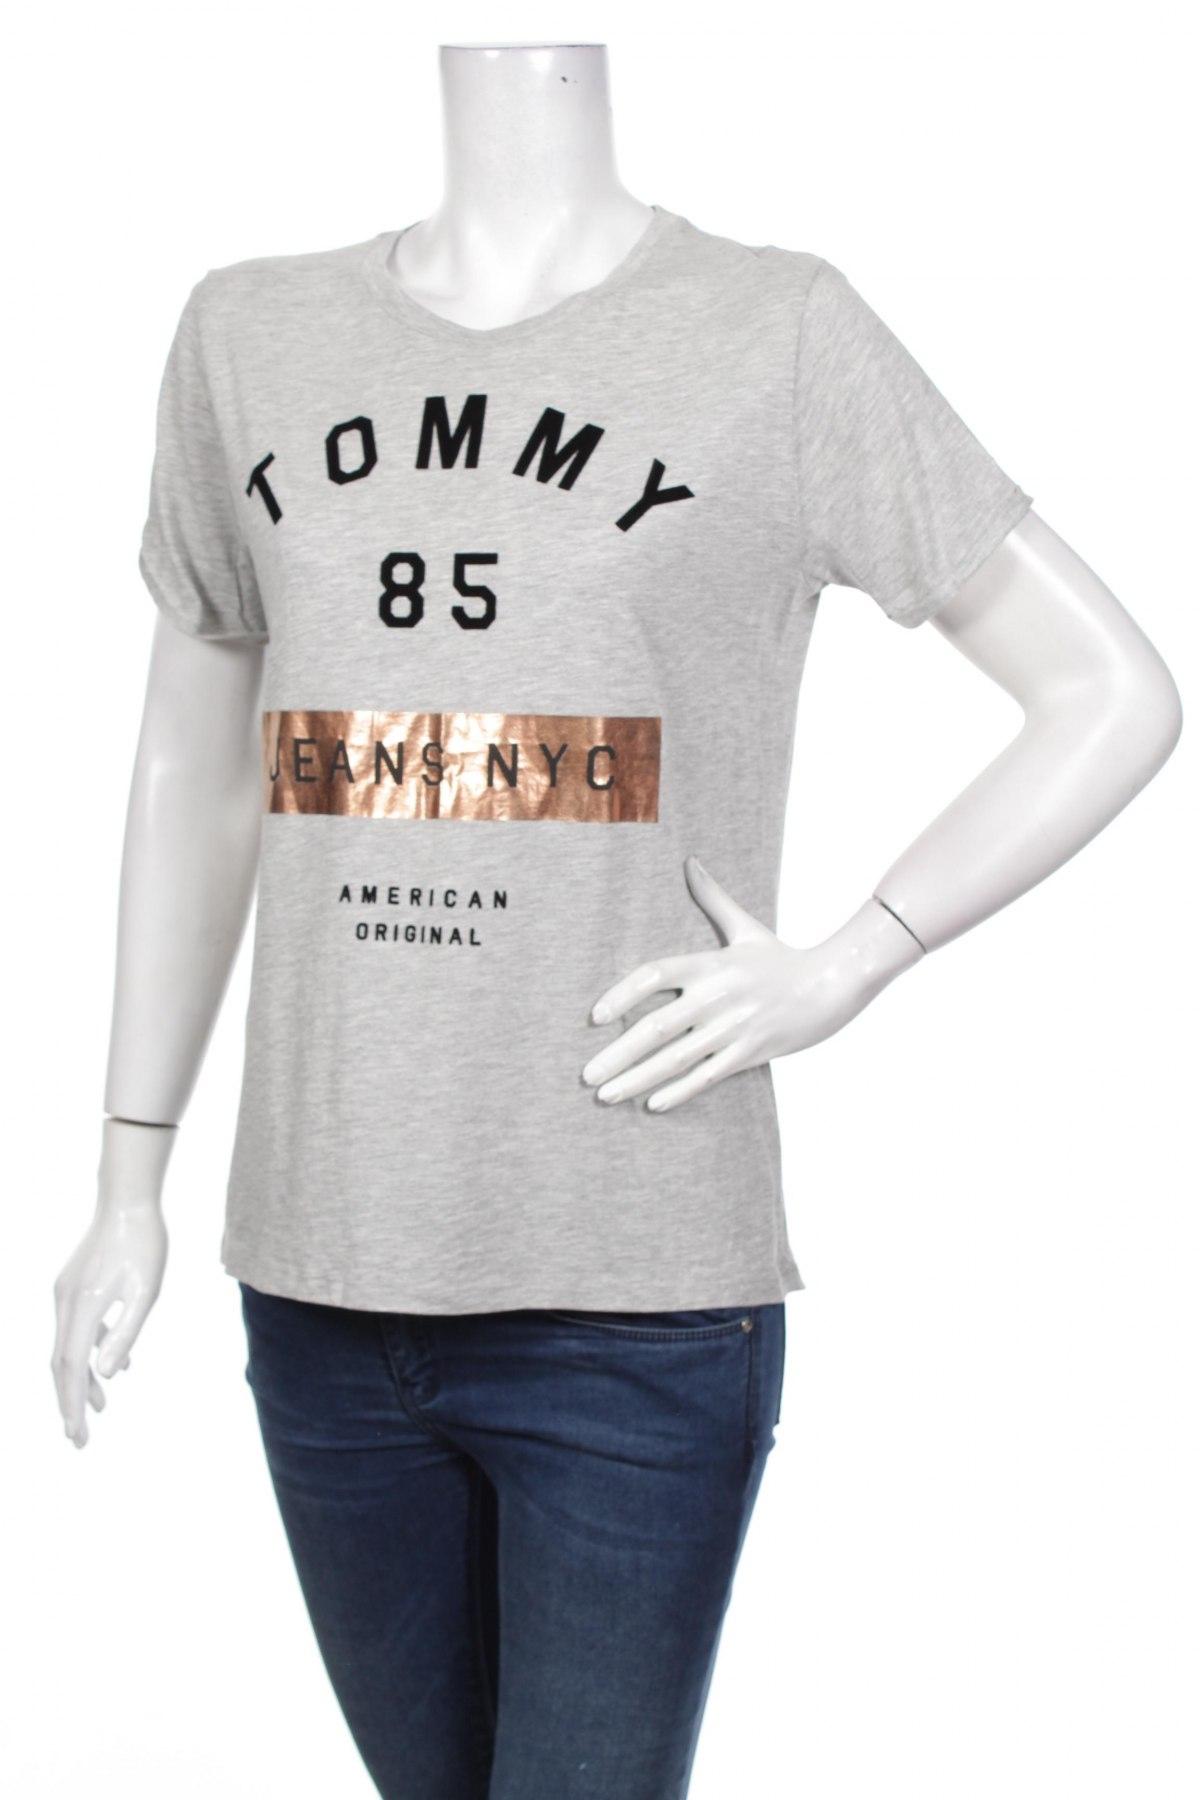 eef3ed5b3023 Γυναικεία μπλούζα Tommy Hilfiger - σε συμφέρουσα τιμή στο Remix ...